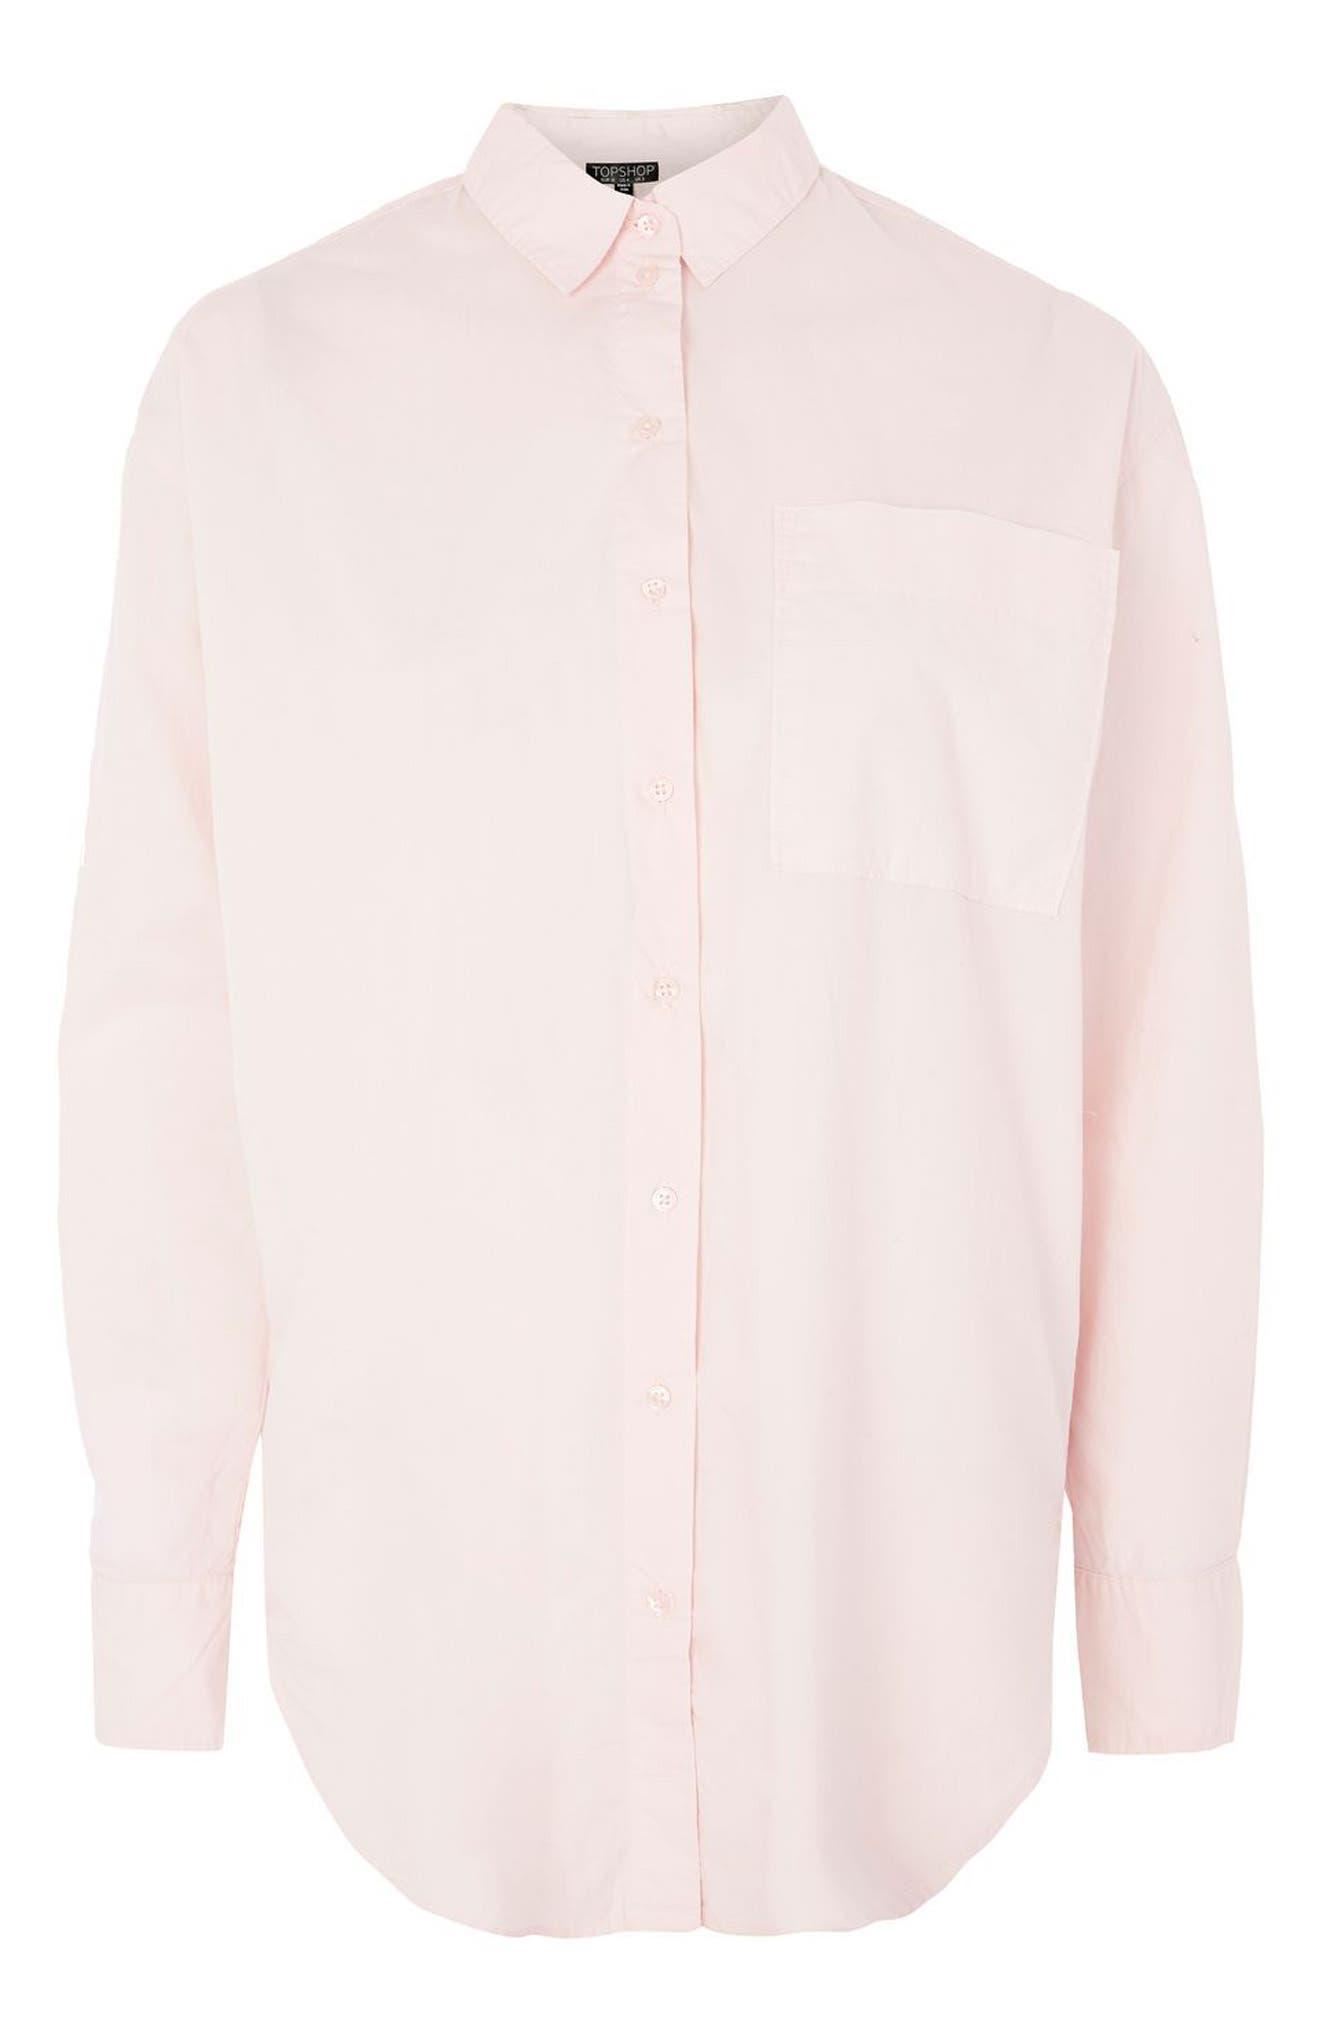 TOPSHOP, Olly Oversize Poplin Shirt, Alternate thumbnail 4, color, 680